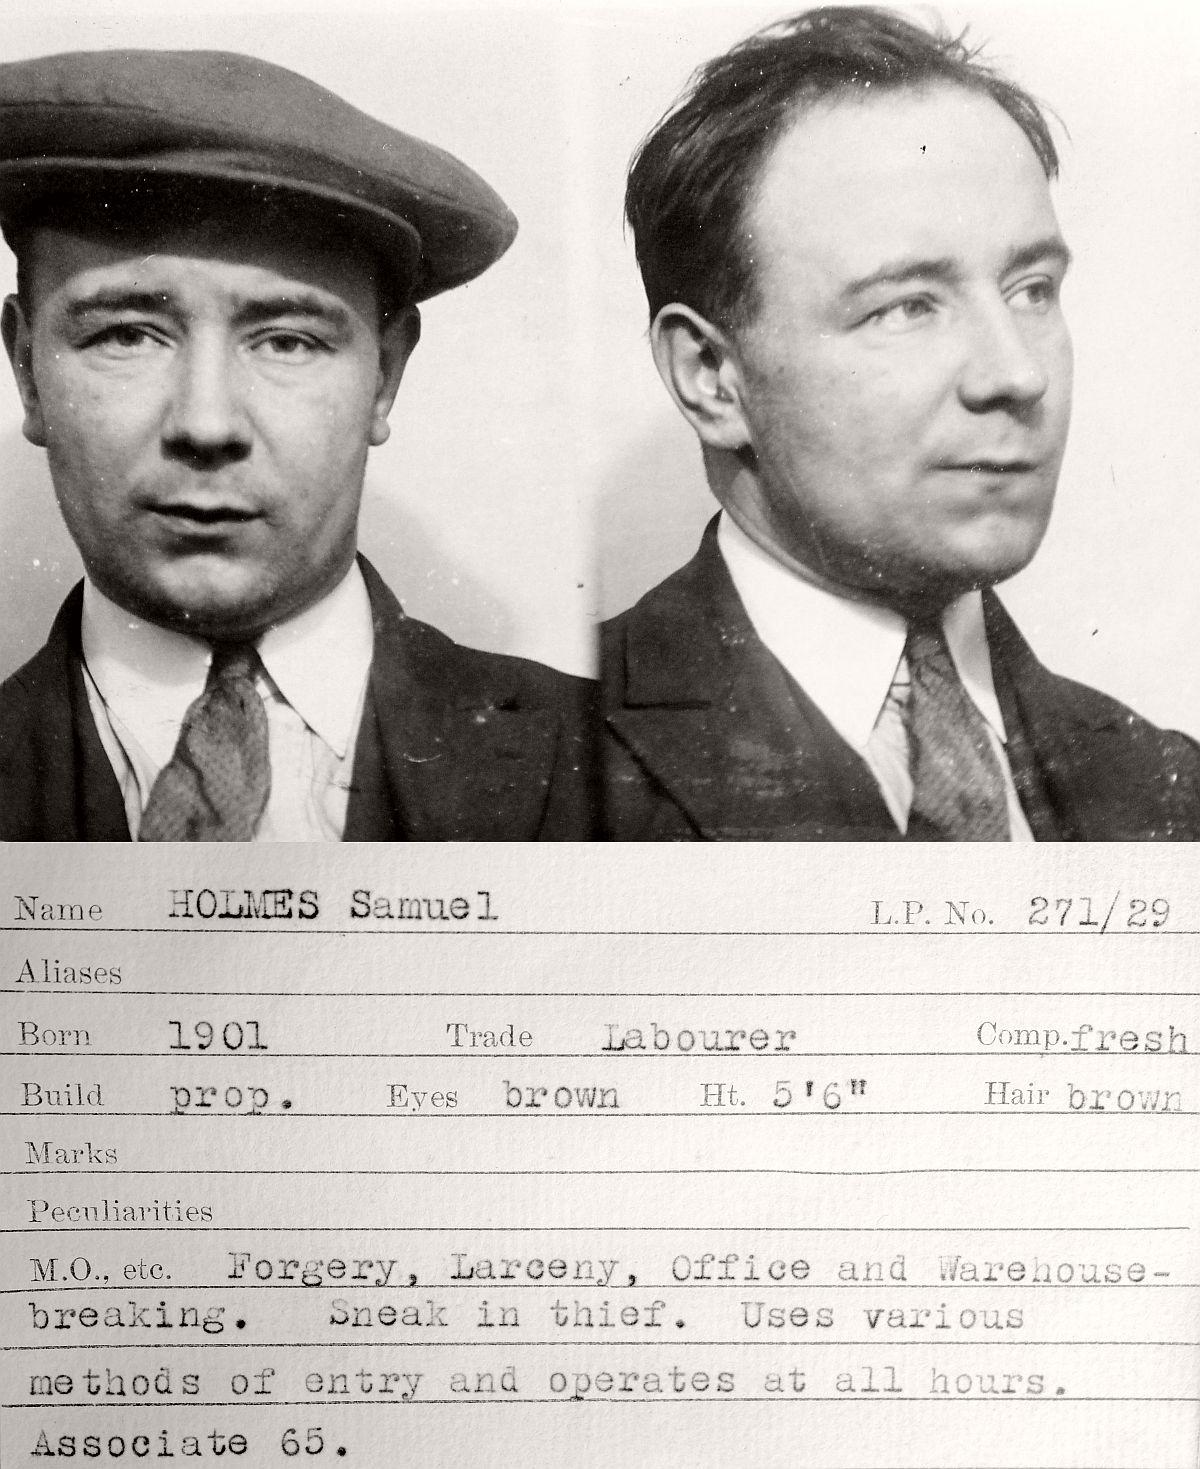 vintage-mug-shot-of-criminals-from-newcastle-upon-tyne-1930s-14